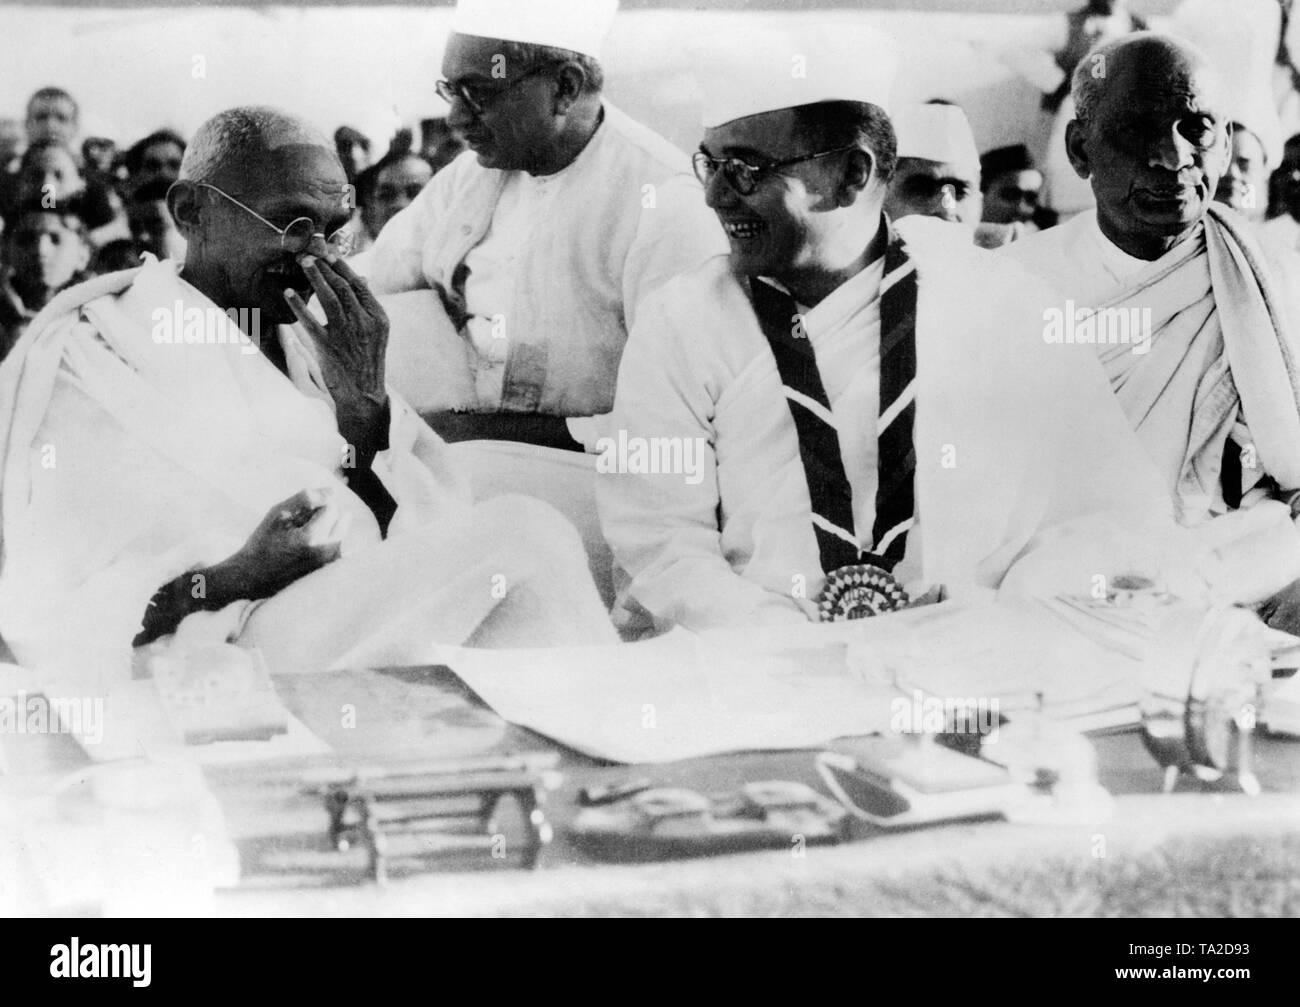 The leader of the Indian Nationalists Mahatma Gandhi and the President of the 51st Indian National Congress in Haripura, Subhas Chandra Bose. Gandhi laughs at a joke of Subhas Chandra Bose. - Stock Image